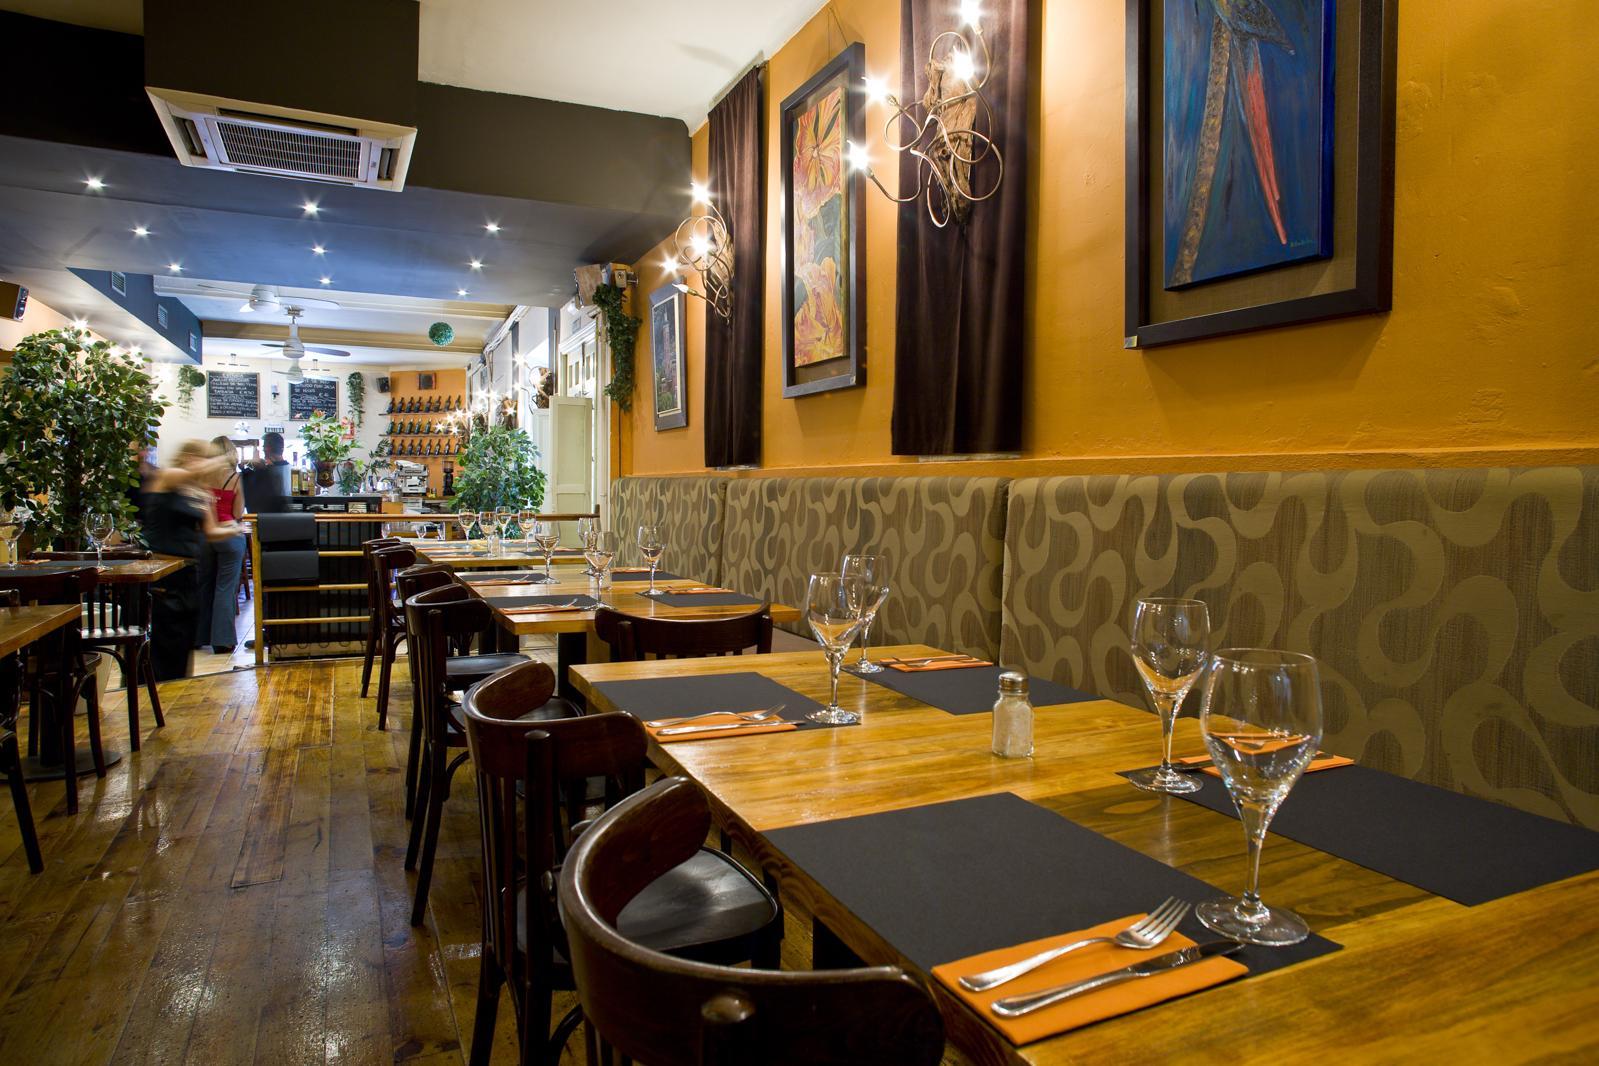 Restaurante Vino Mío - fotógrafo Andreas Grunau - xploras.